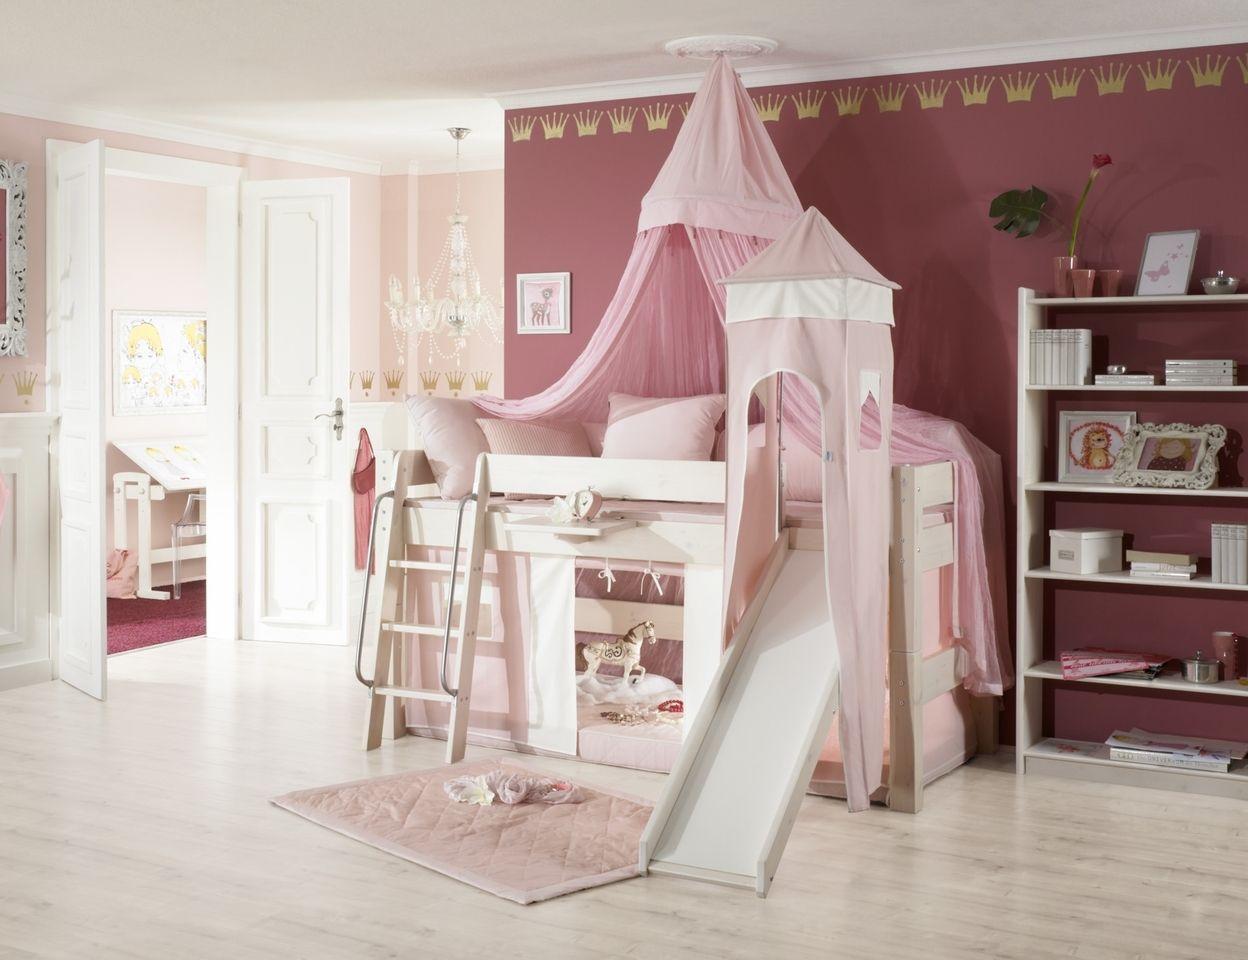 prinzessinnen hochbett mit rutsche weiss rosa pinteres. Black Bedroom Furniture Sets. Home Design Ideas